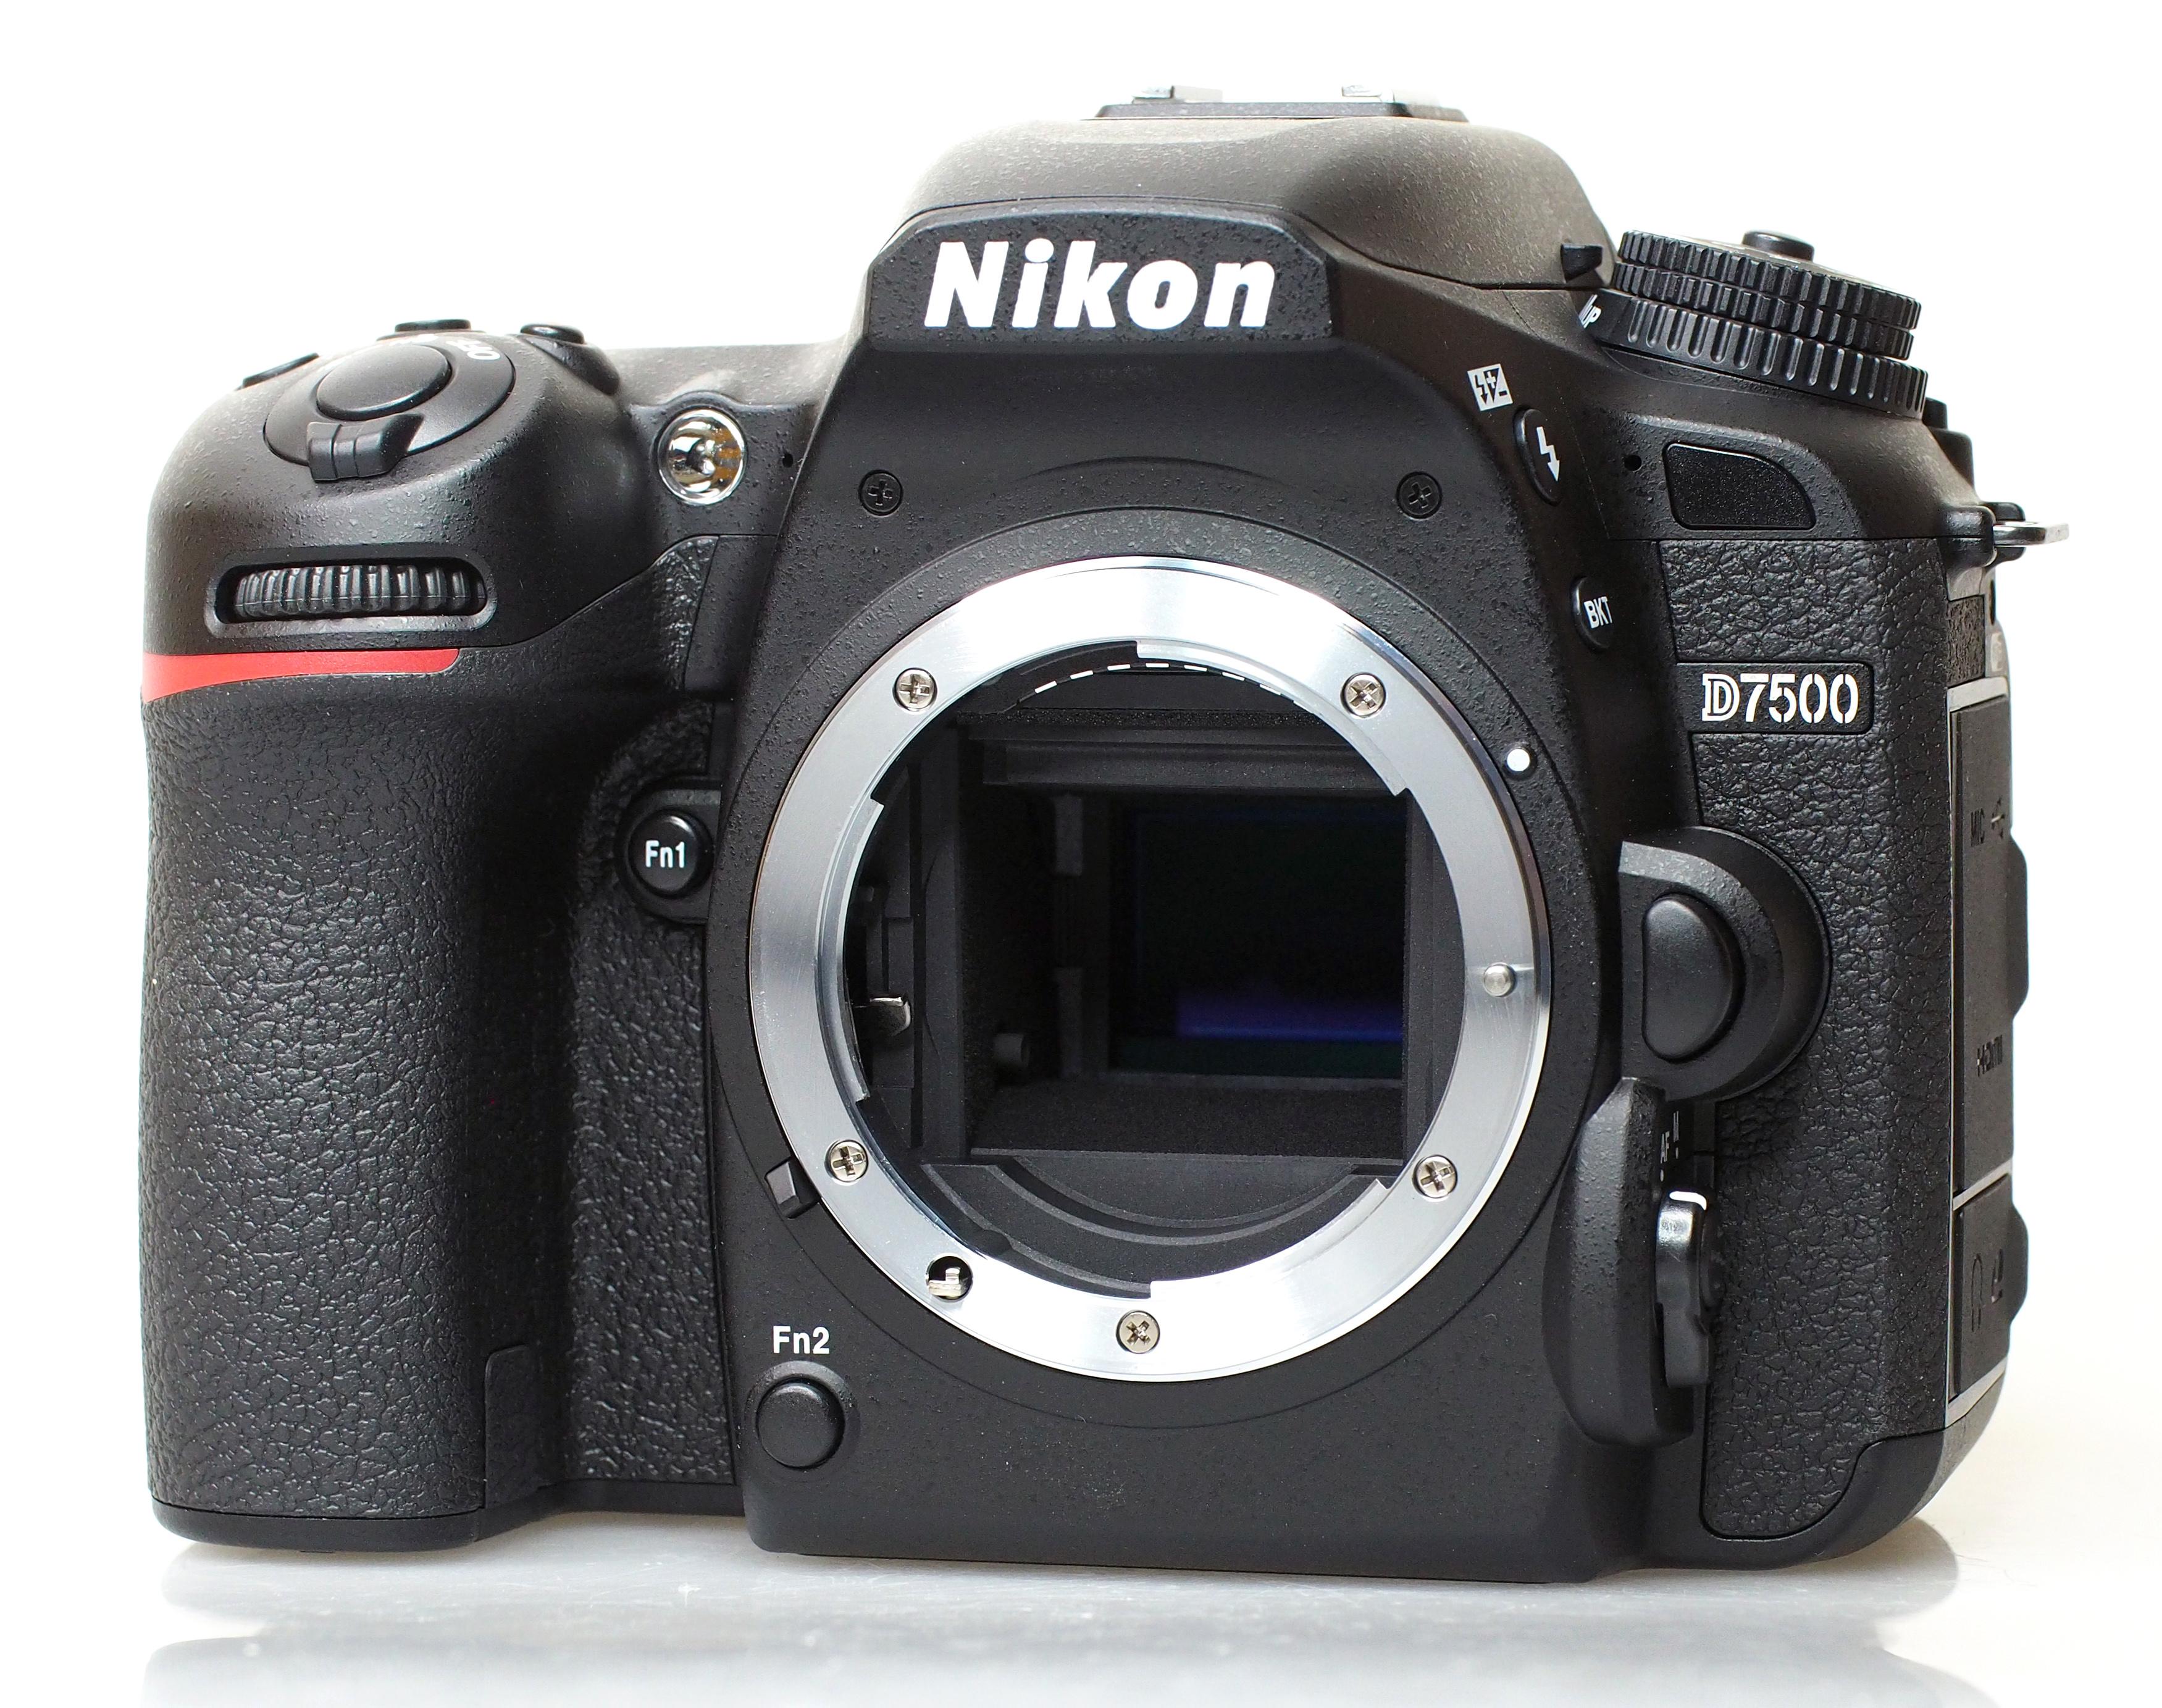 highres-Nikon-D7500-DSLR-1_1497440313.jp